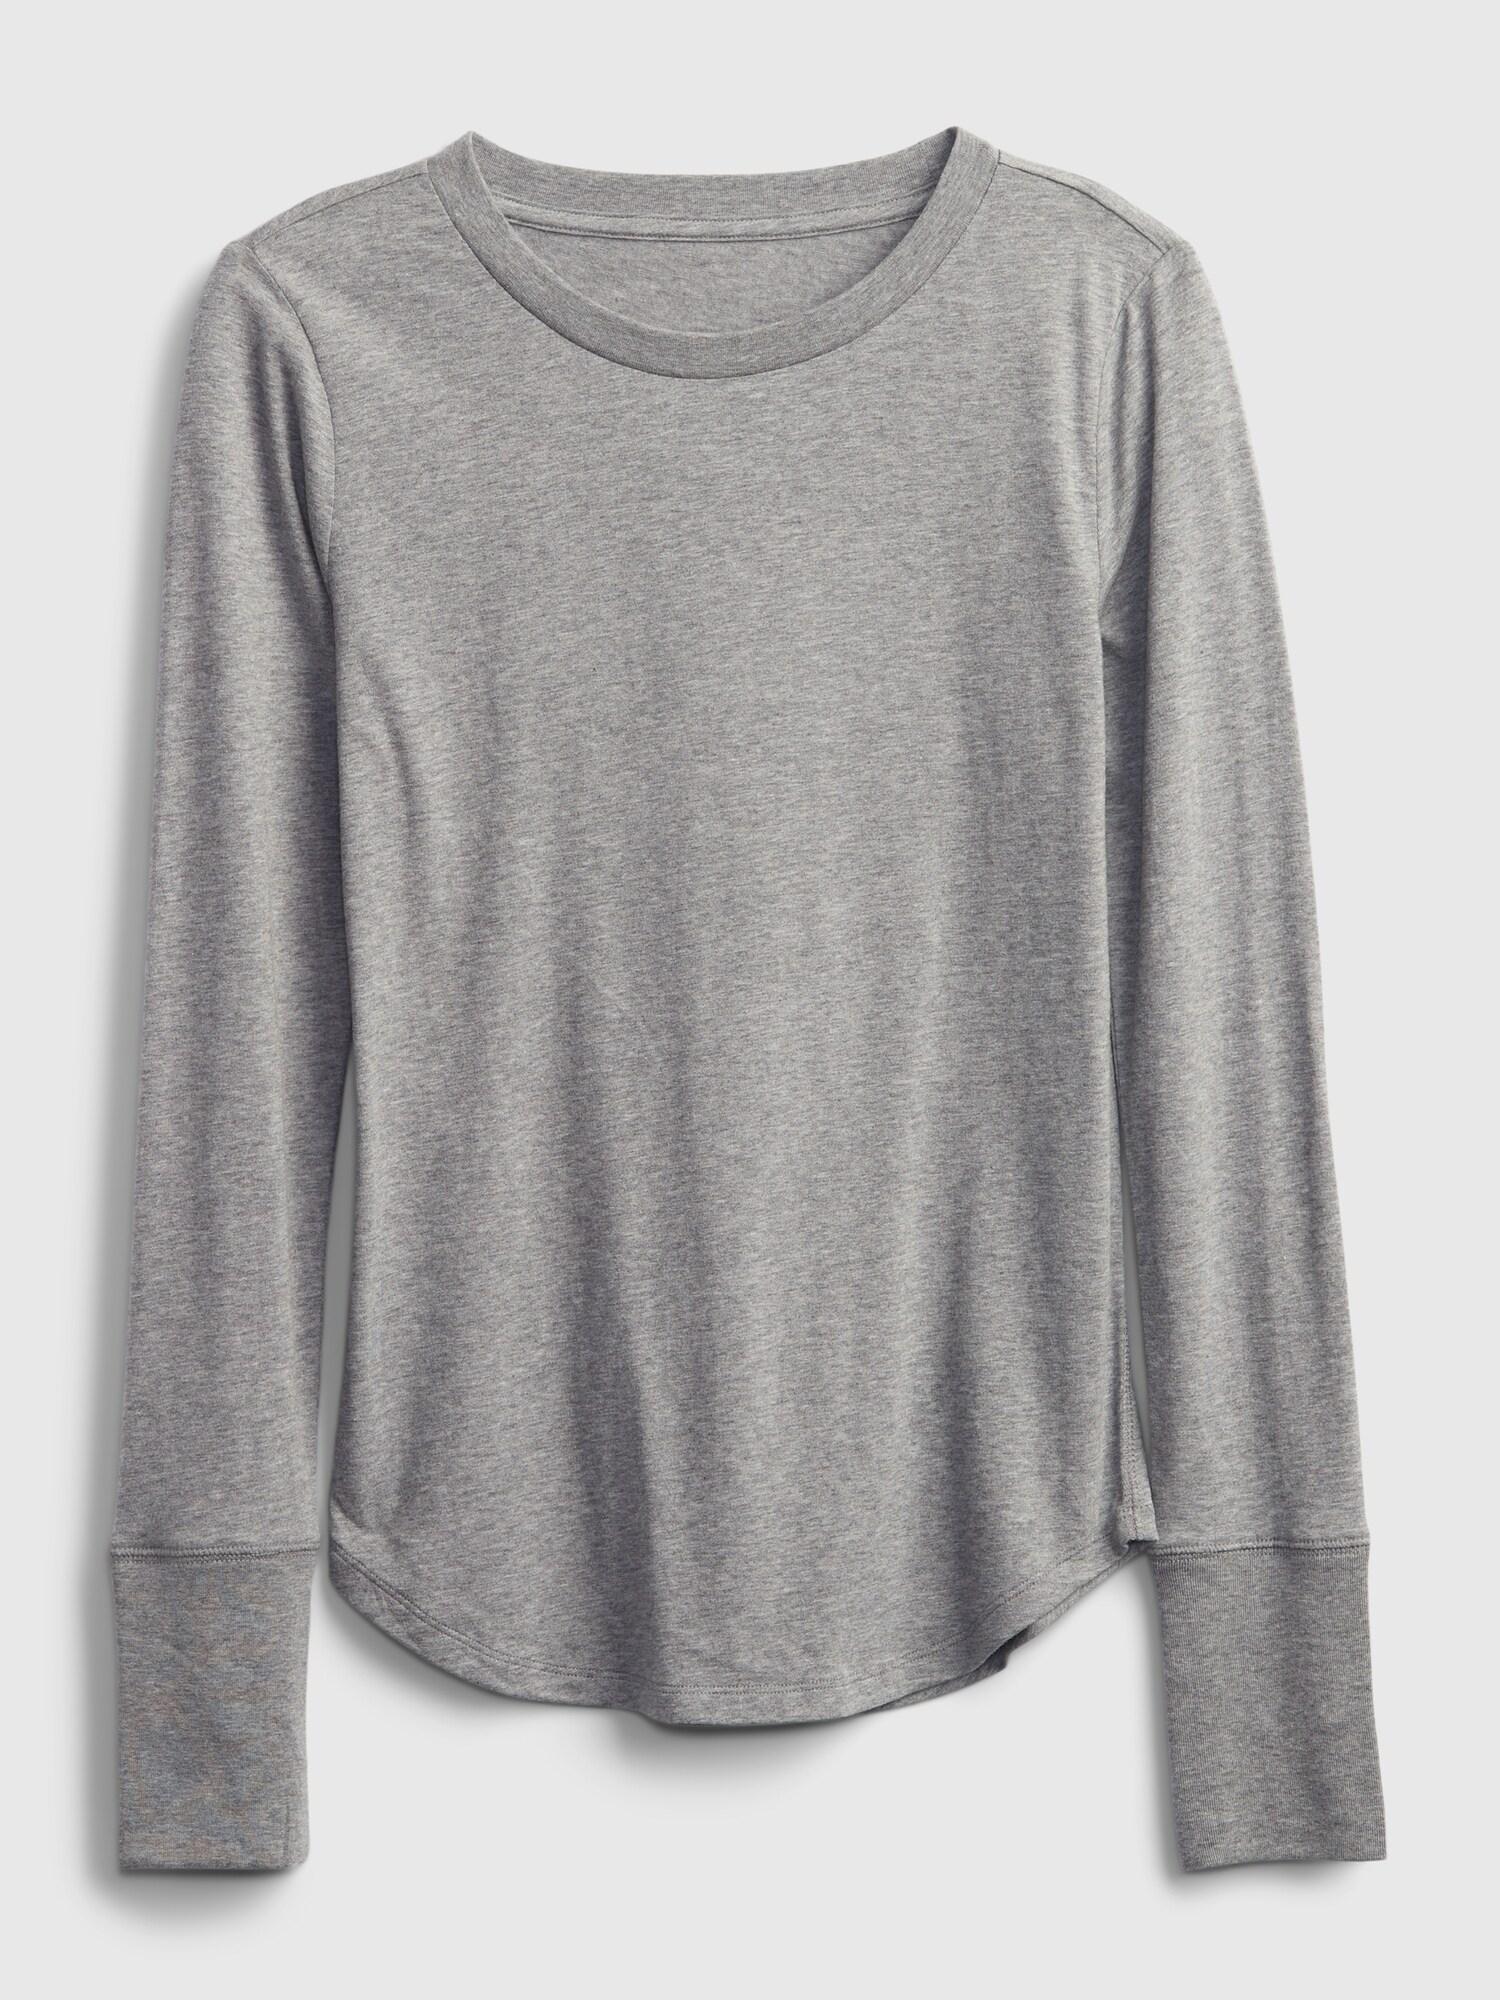 Tricou gri cu mâneci lungi pentru femei